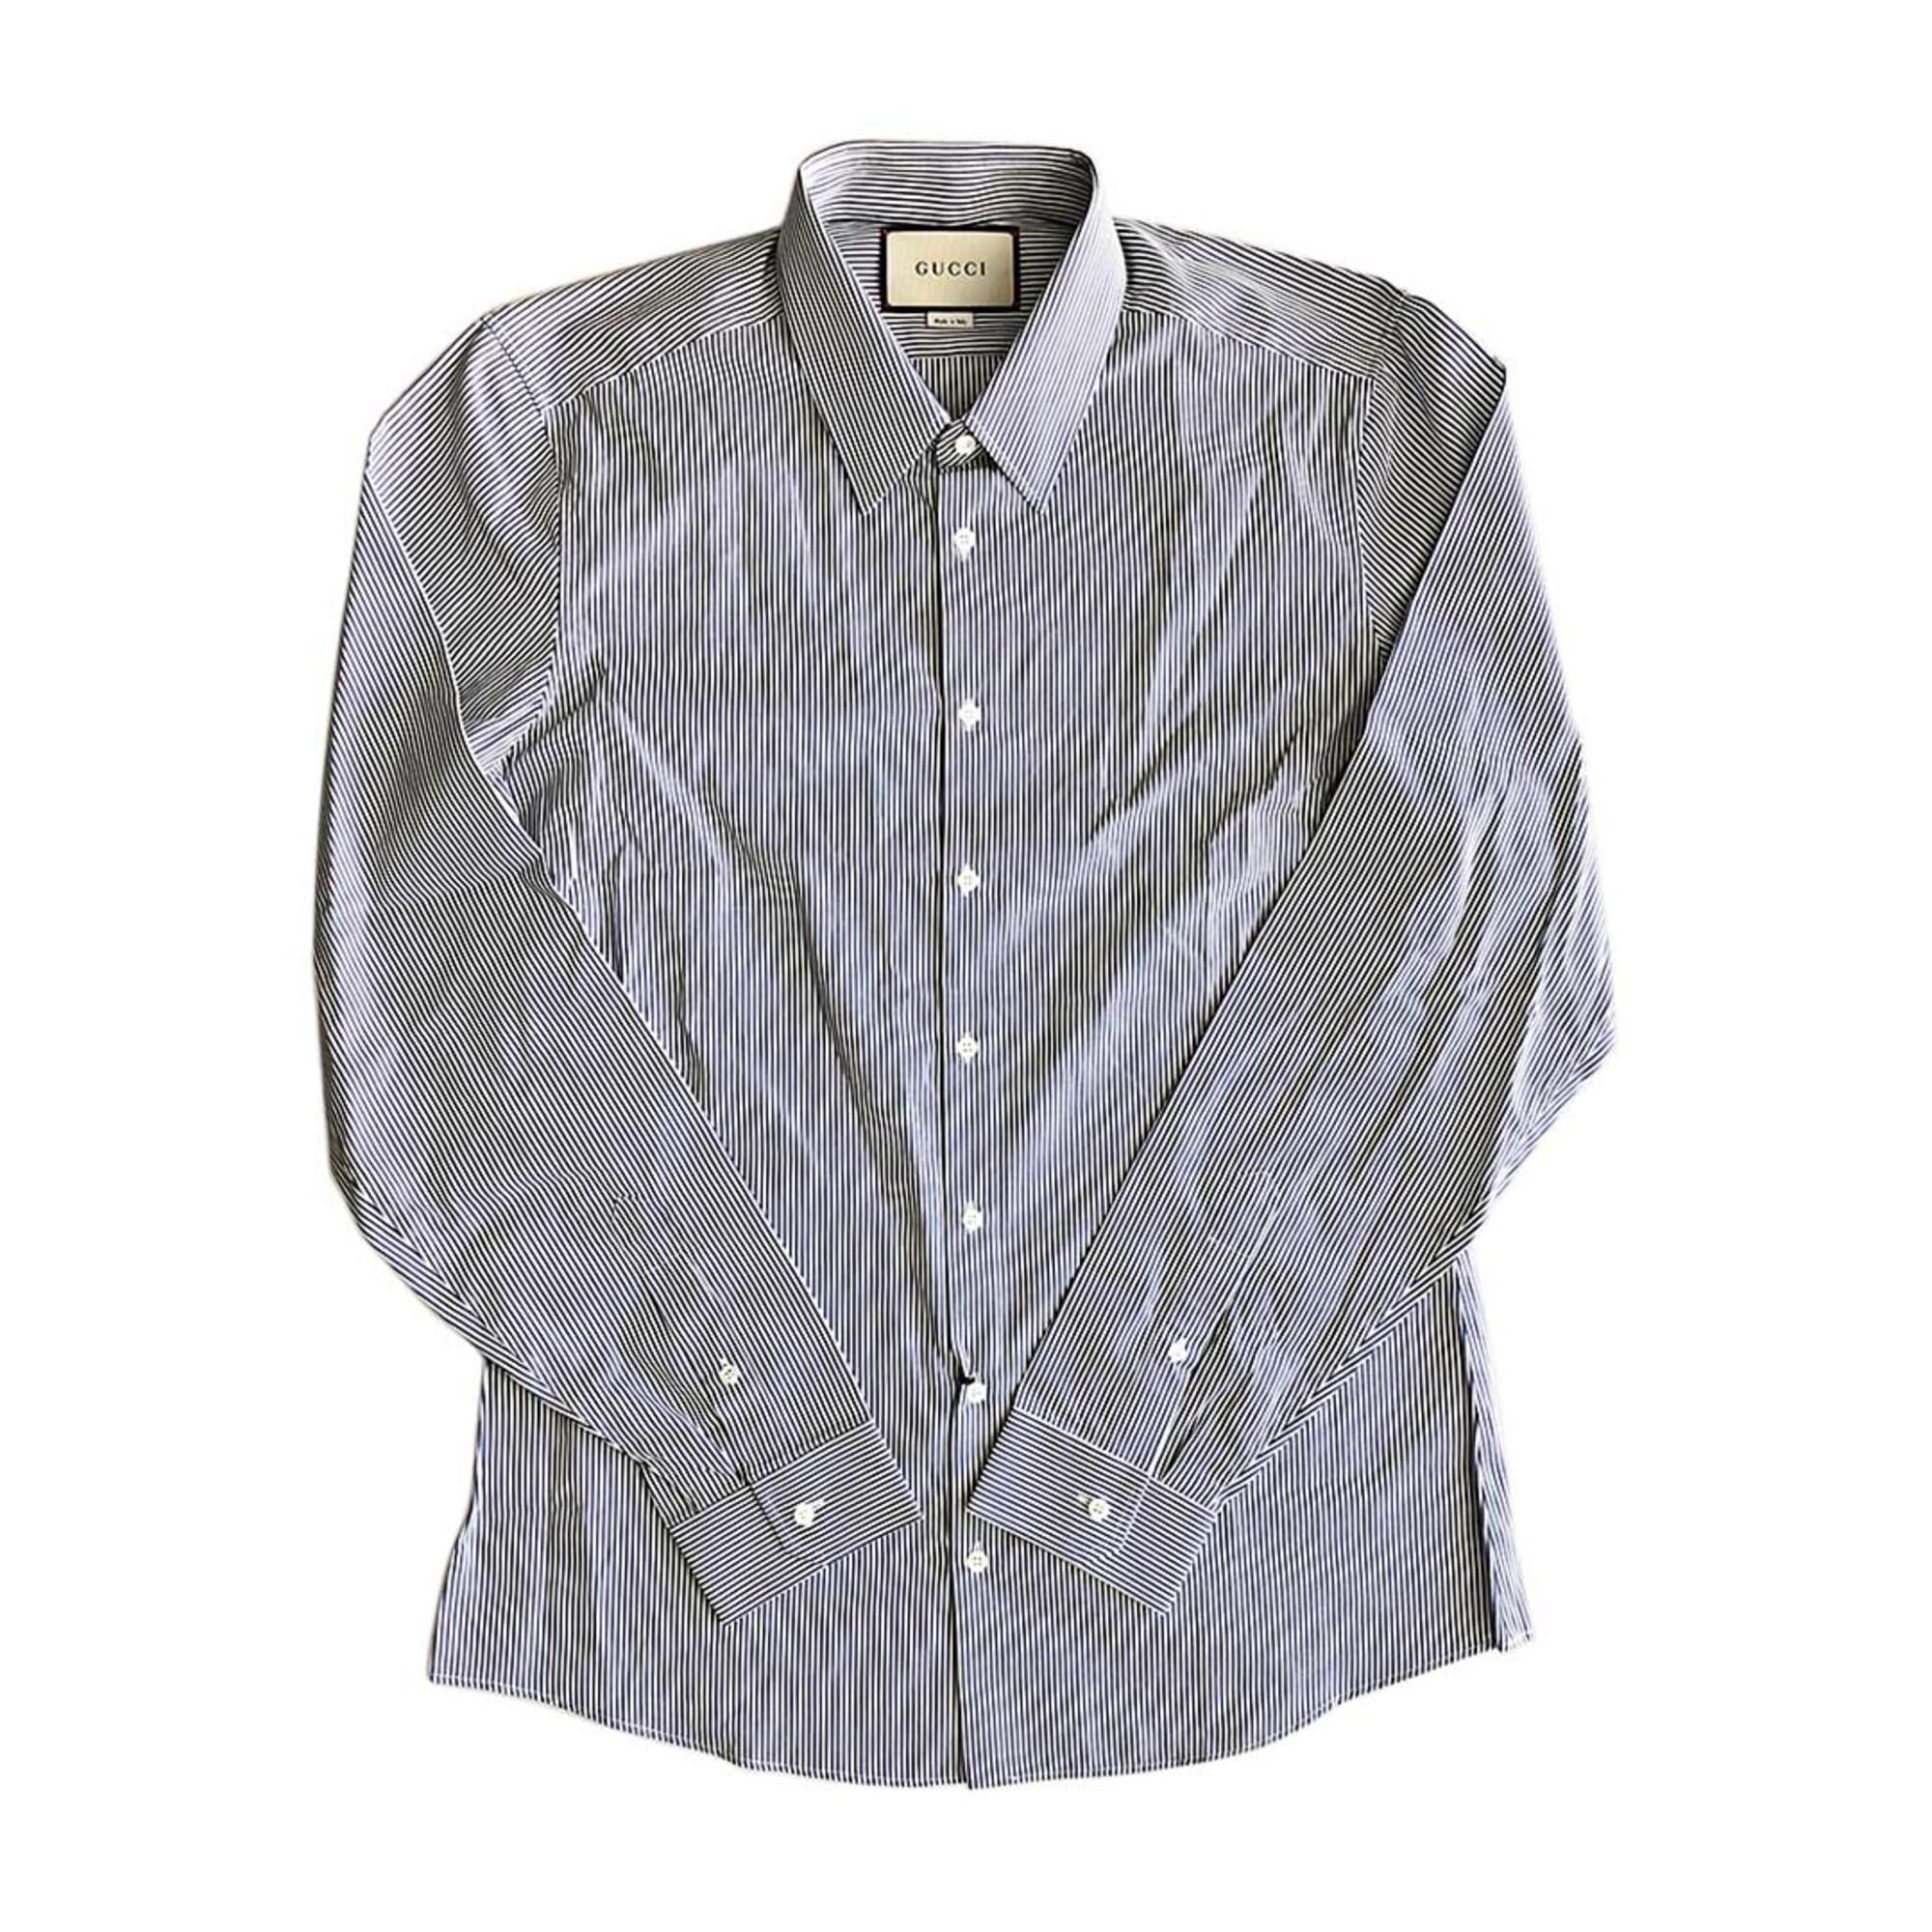 Chemise GUCCI bleu / blanc rayure